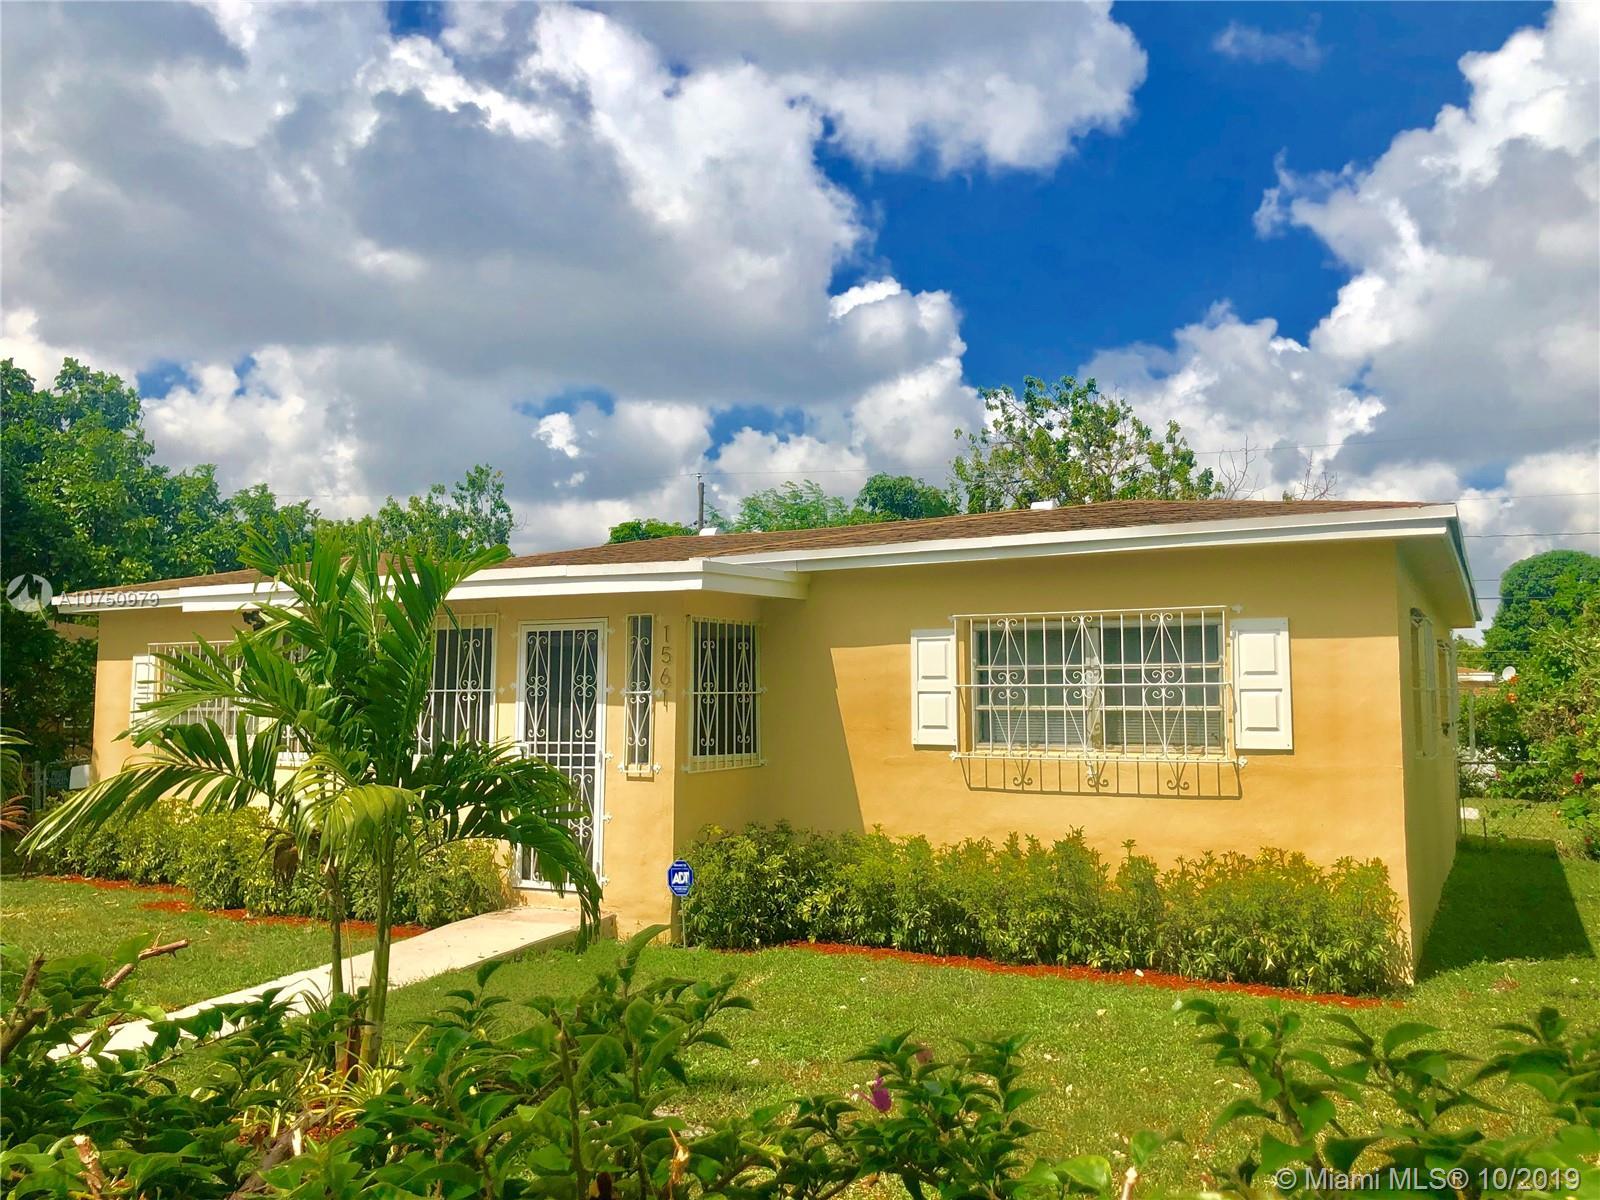 1561 NW 131st St, Miami, FL 33167